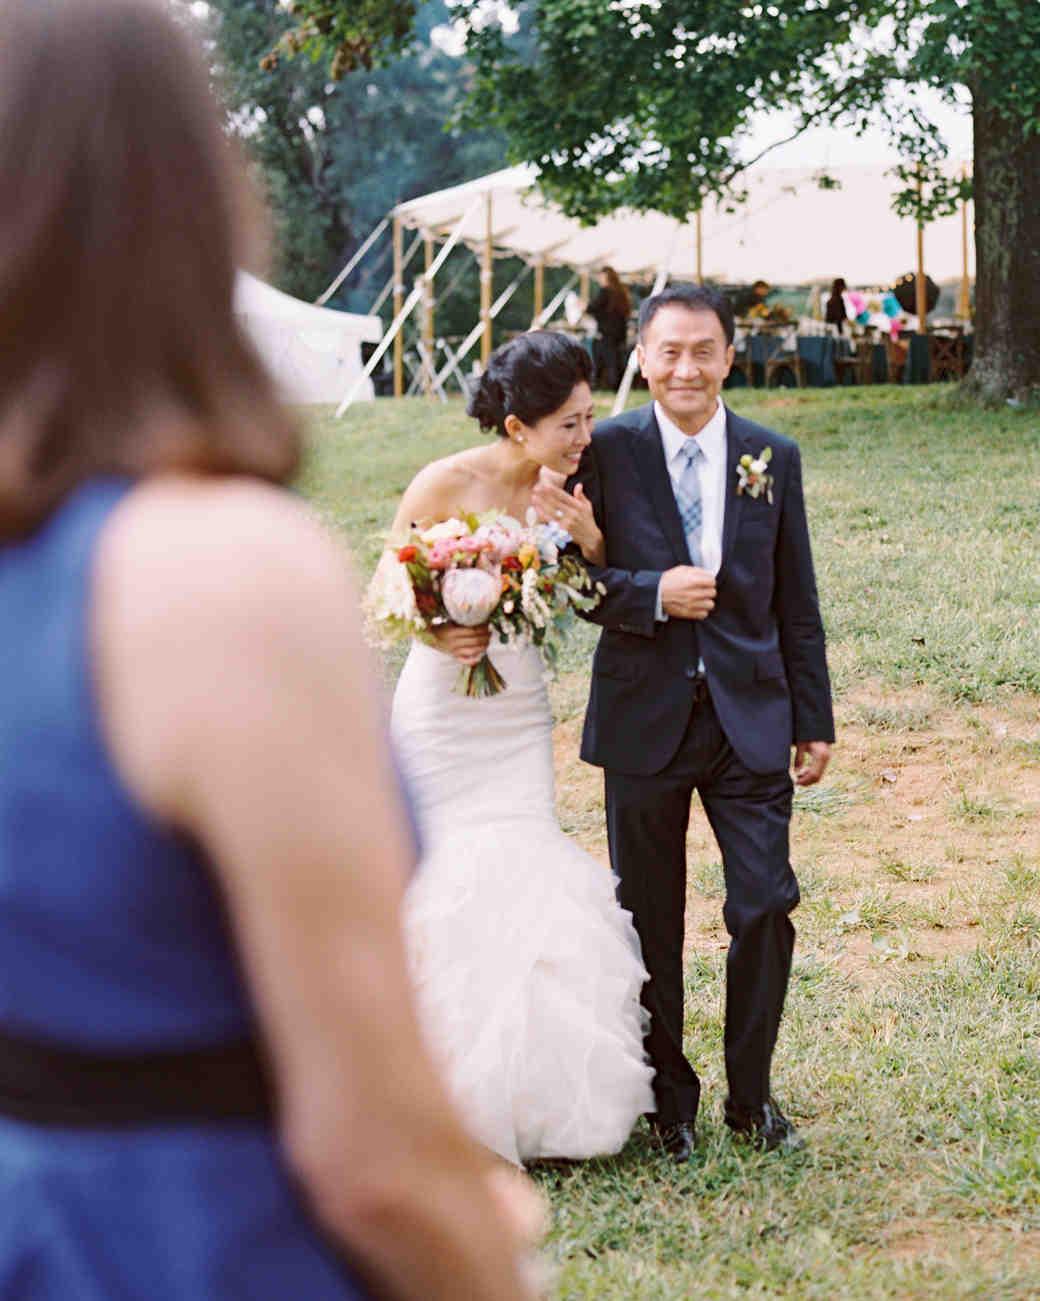 michelle-john-wedding-north-carolina-7-s111840-0215.jpg